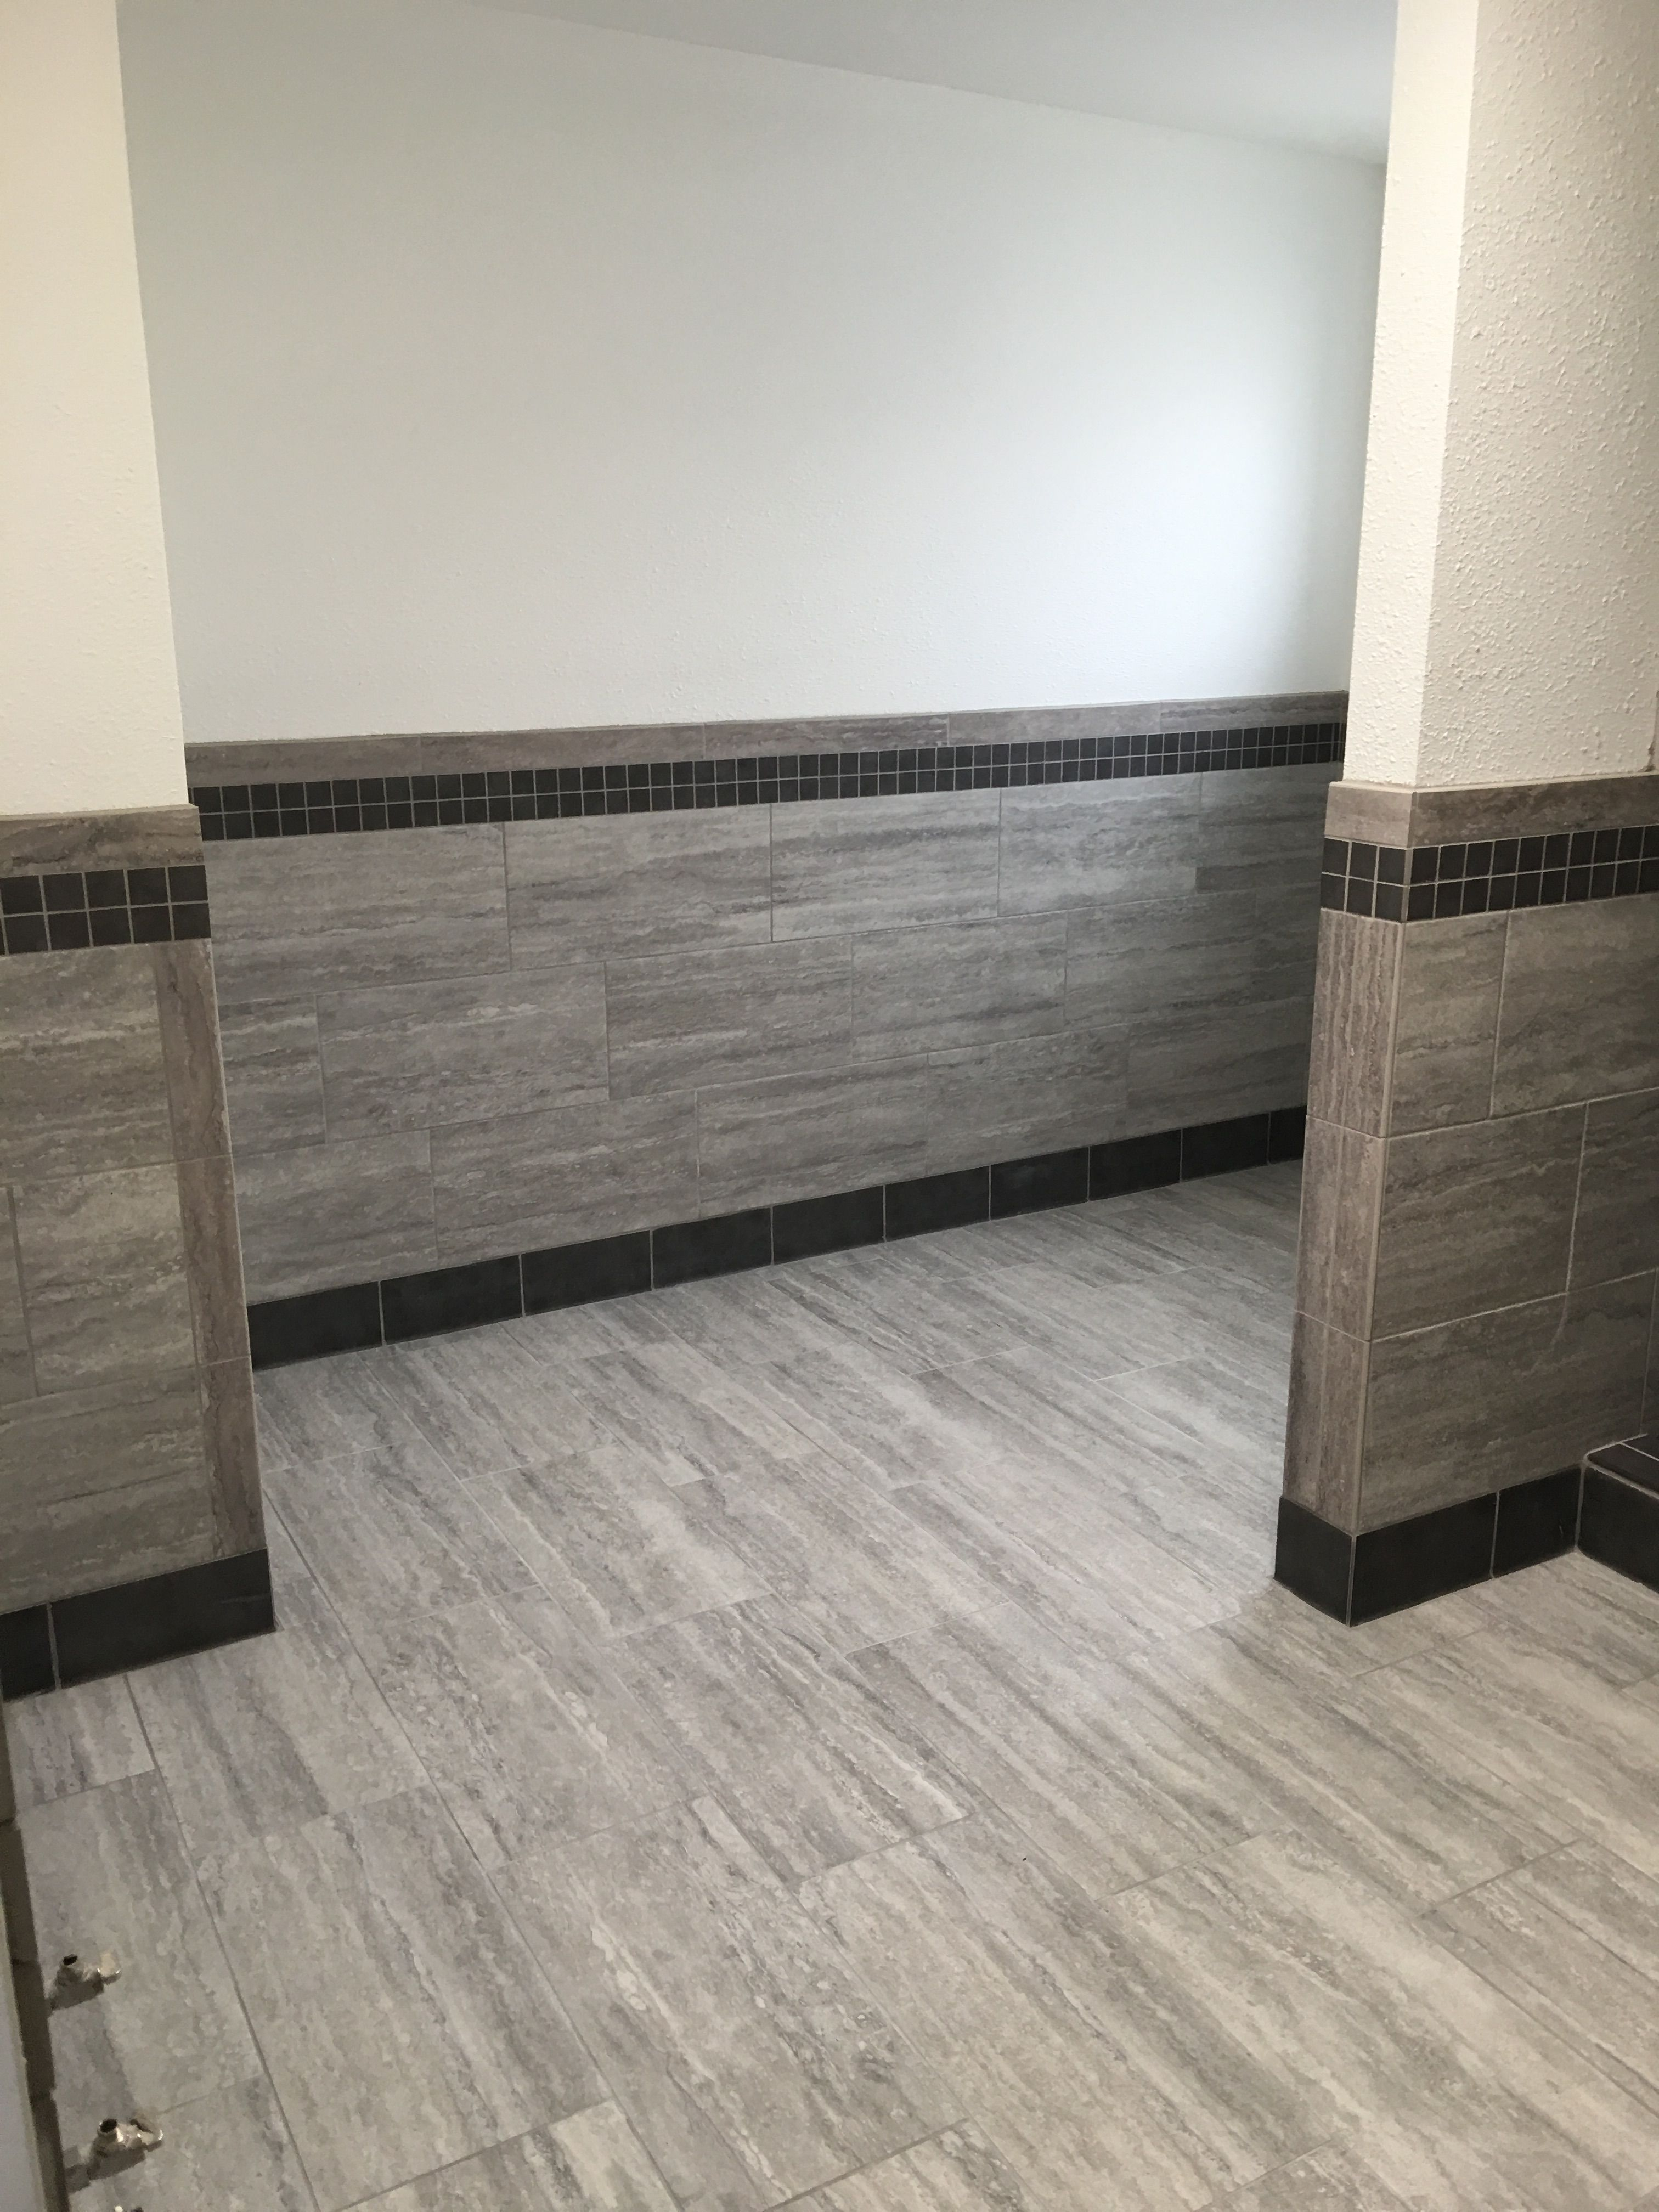 Commercial bathroom Commercial bathroom ideas